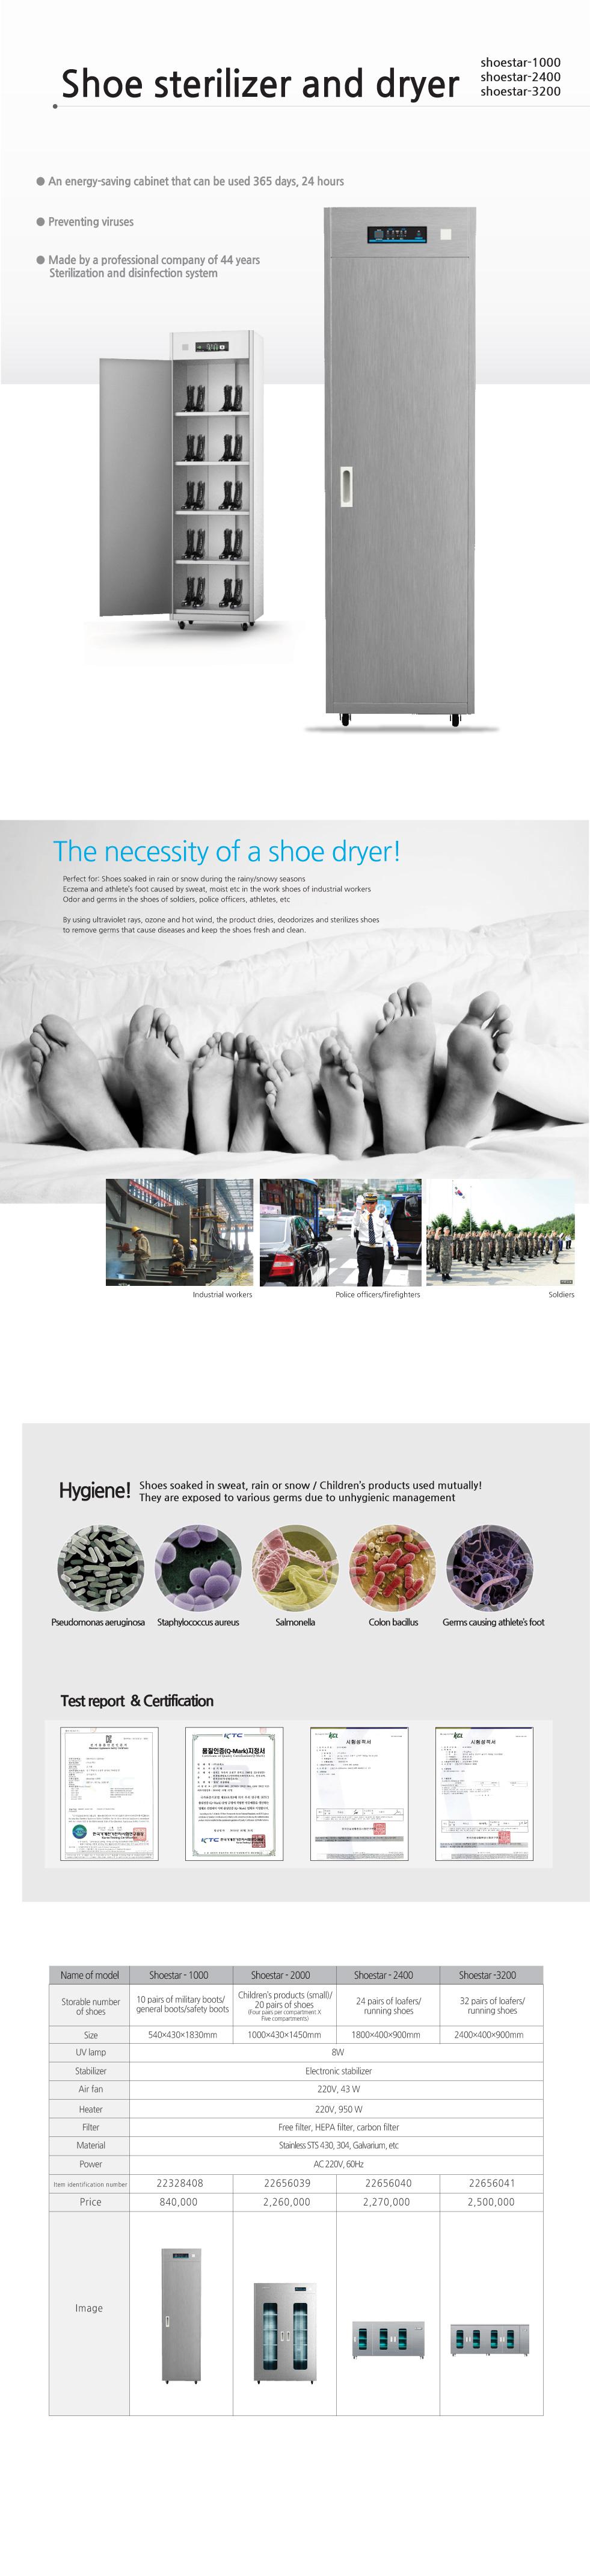 OMAX Shoes Dryer shoestar-1000/2000/2400/3200